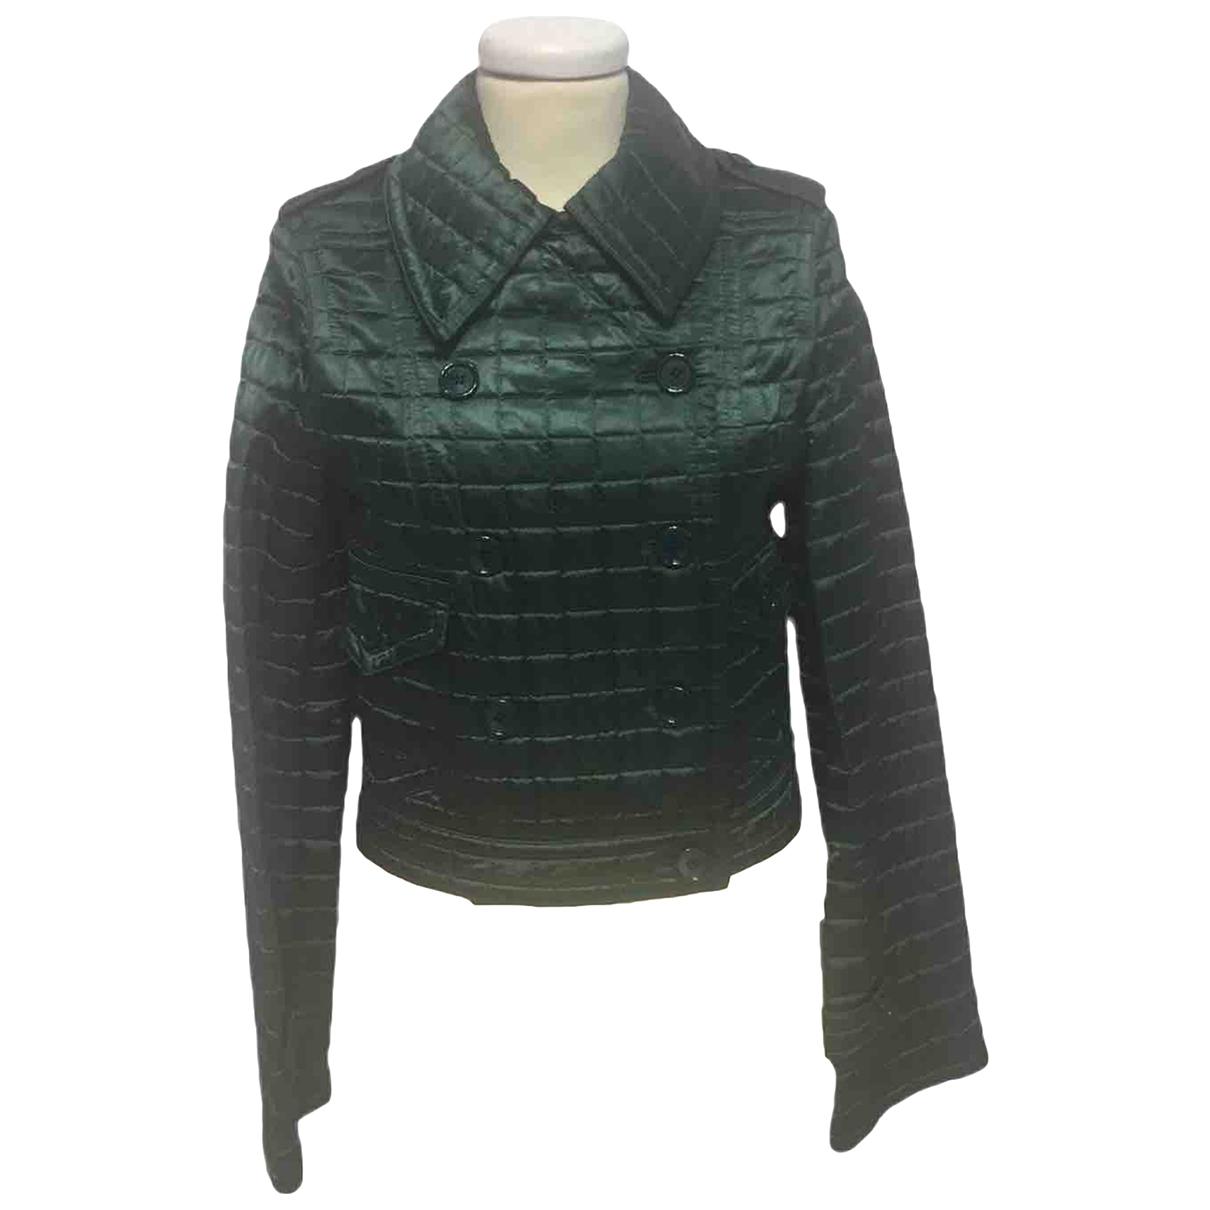 Miu Miu \N Green jacket for Women 38 IT